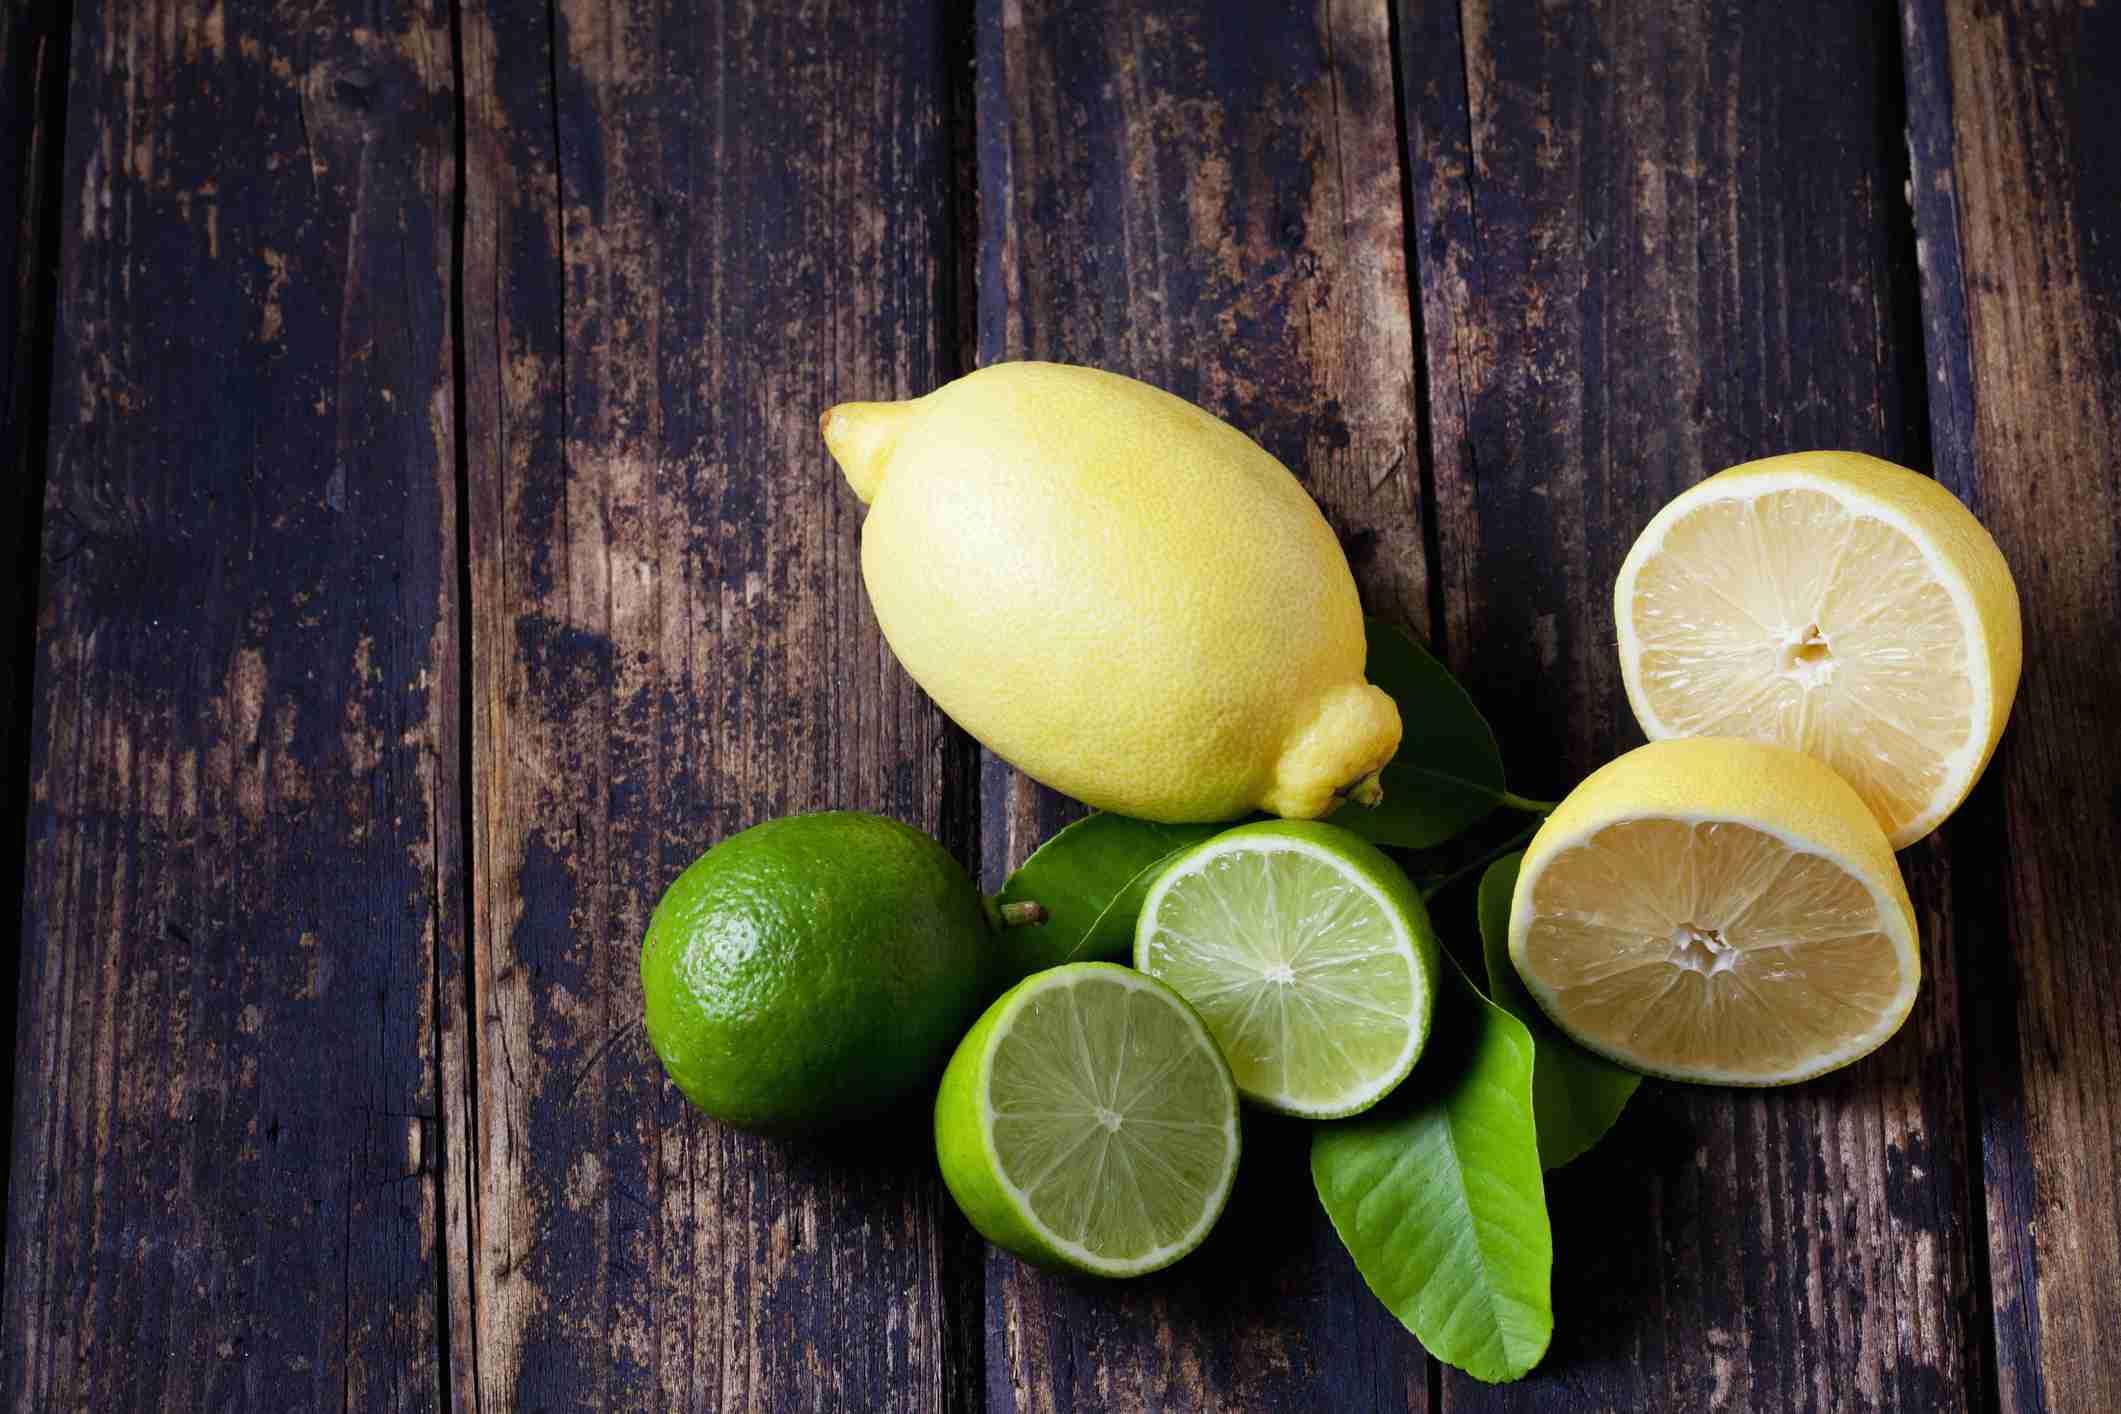 limón verde y limón amarillo